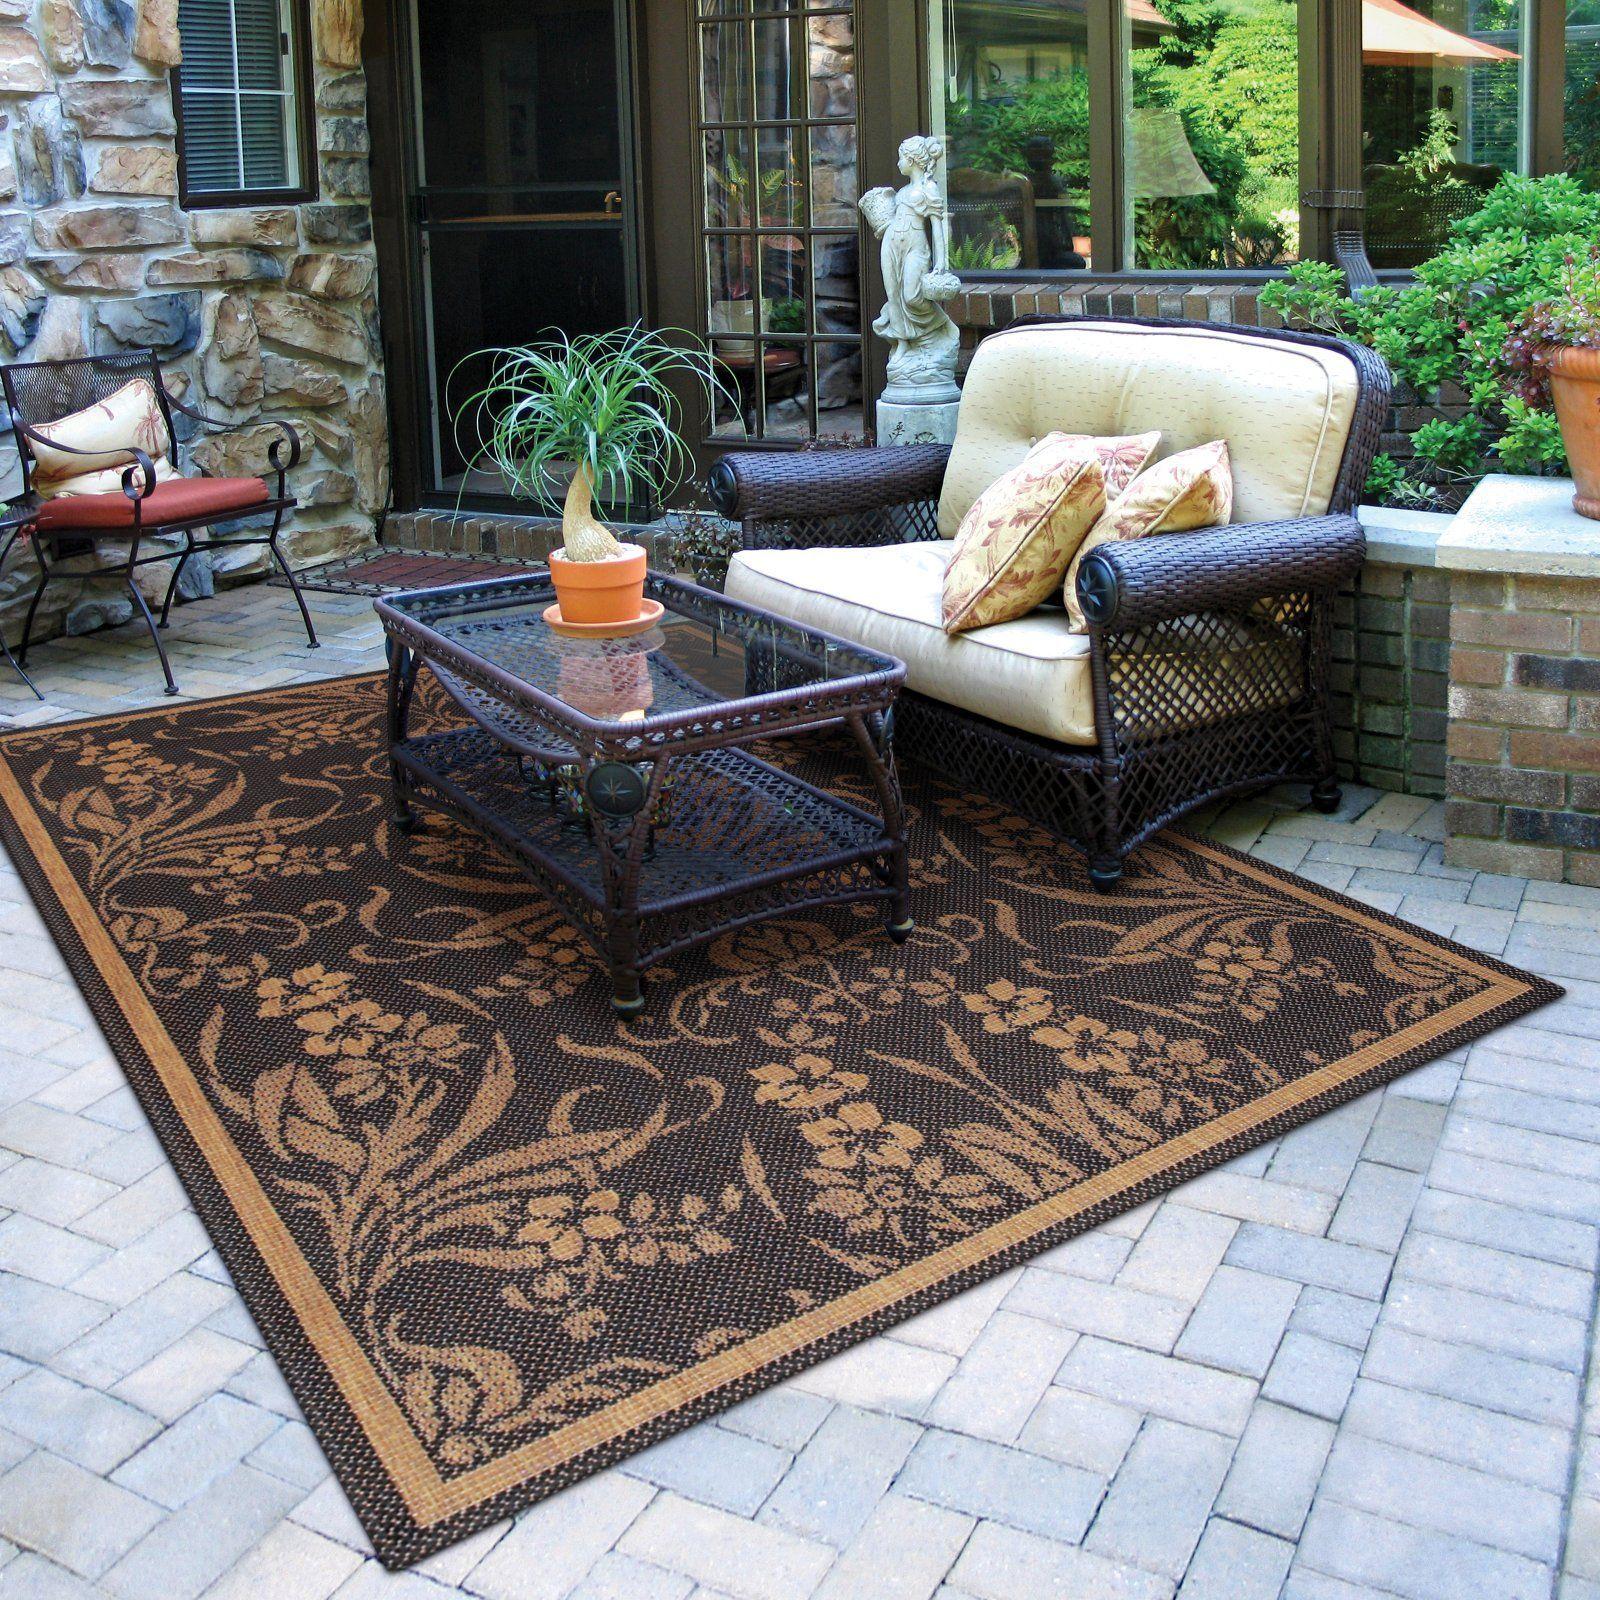 beautiful floral brown outdoor carpet brown area rugs pinterest rh pinterest com outdoor carpet for patio 5 x 8 outdoor carpet for patios - water resistant